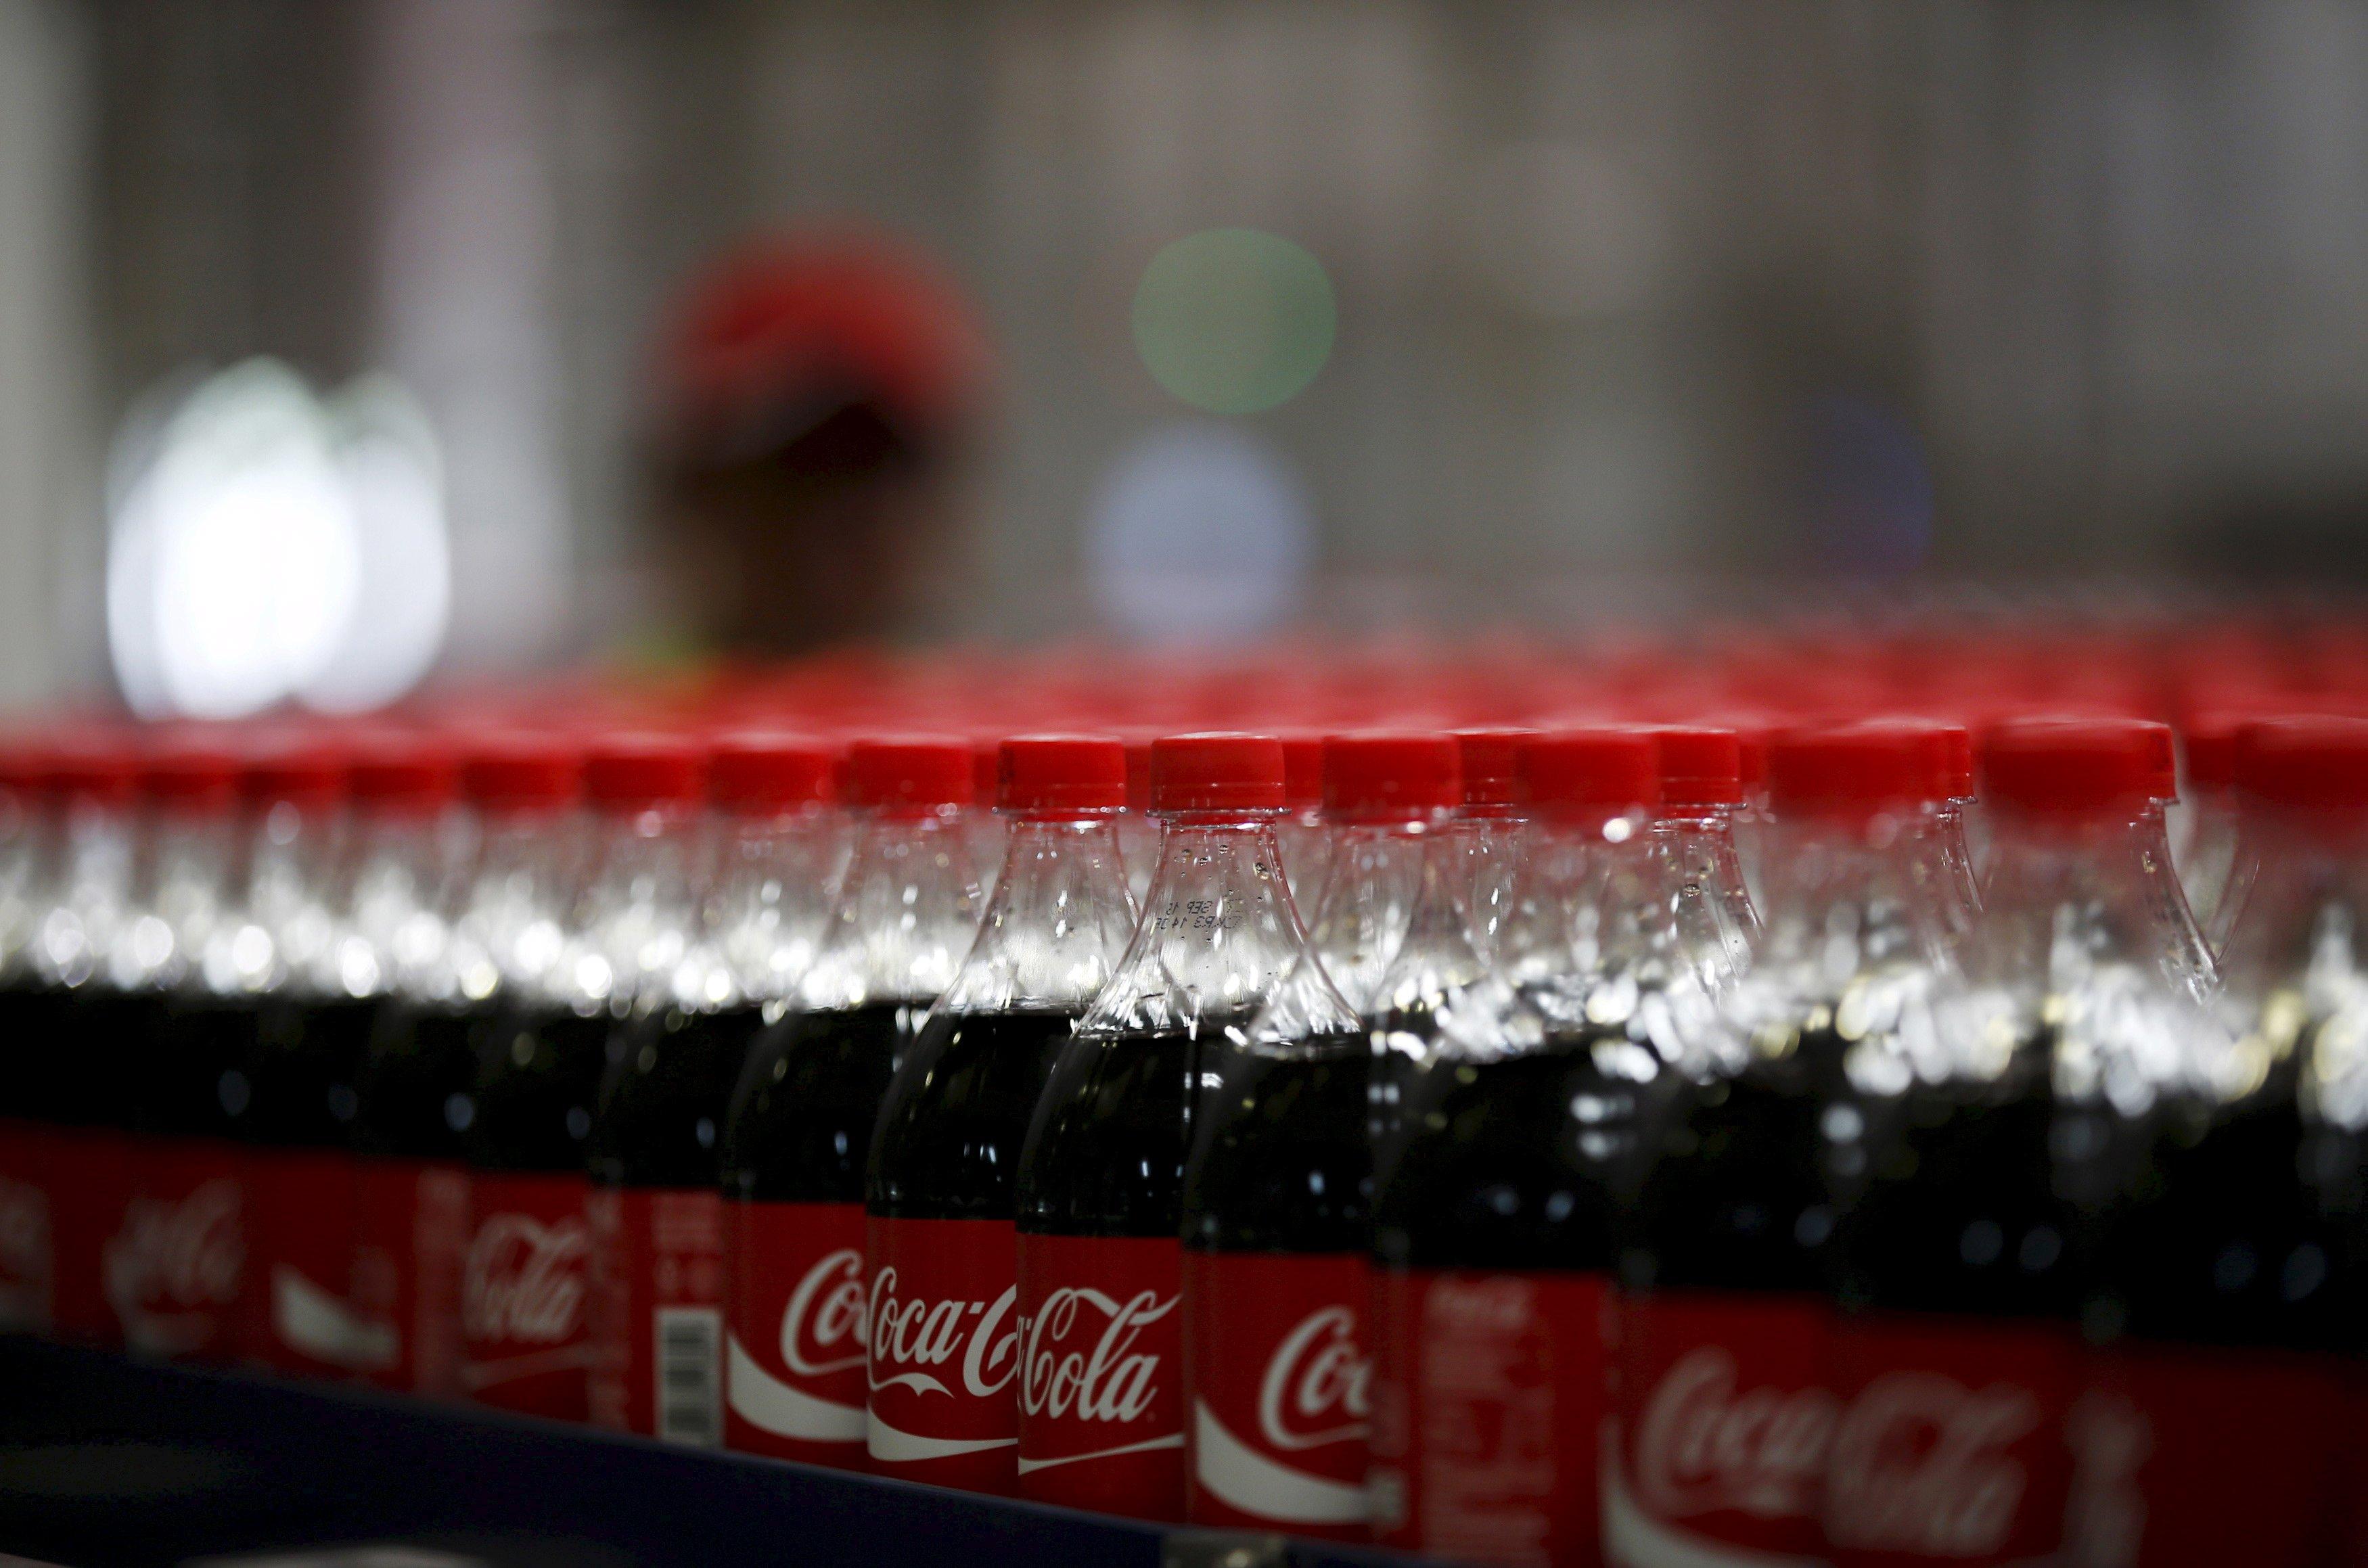 Coca-Cola Τρία Έψιλον: Διακρίθηκε για τα προγράμματα Υγείας-Ασφάλειας | tovima.gr